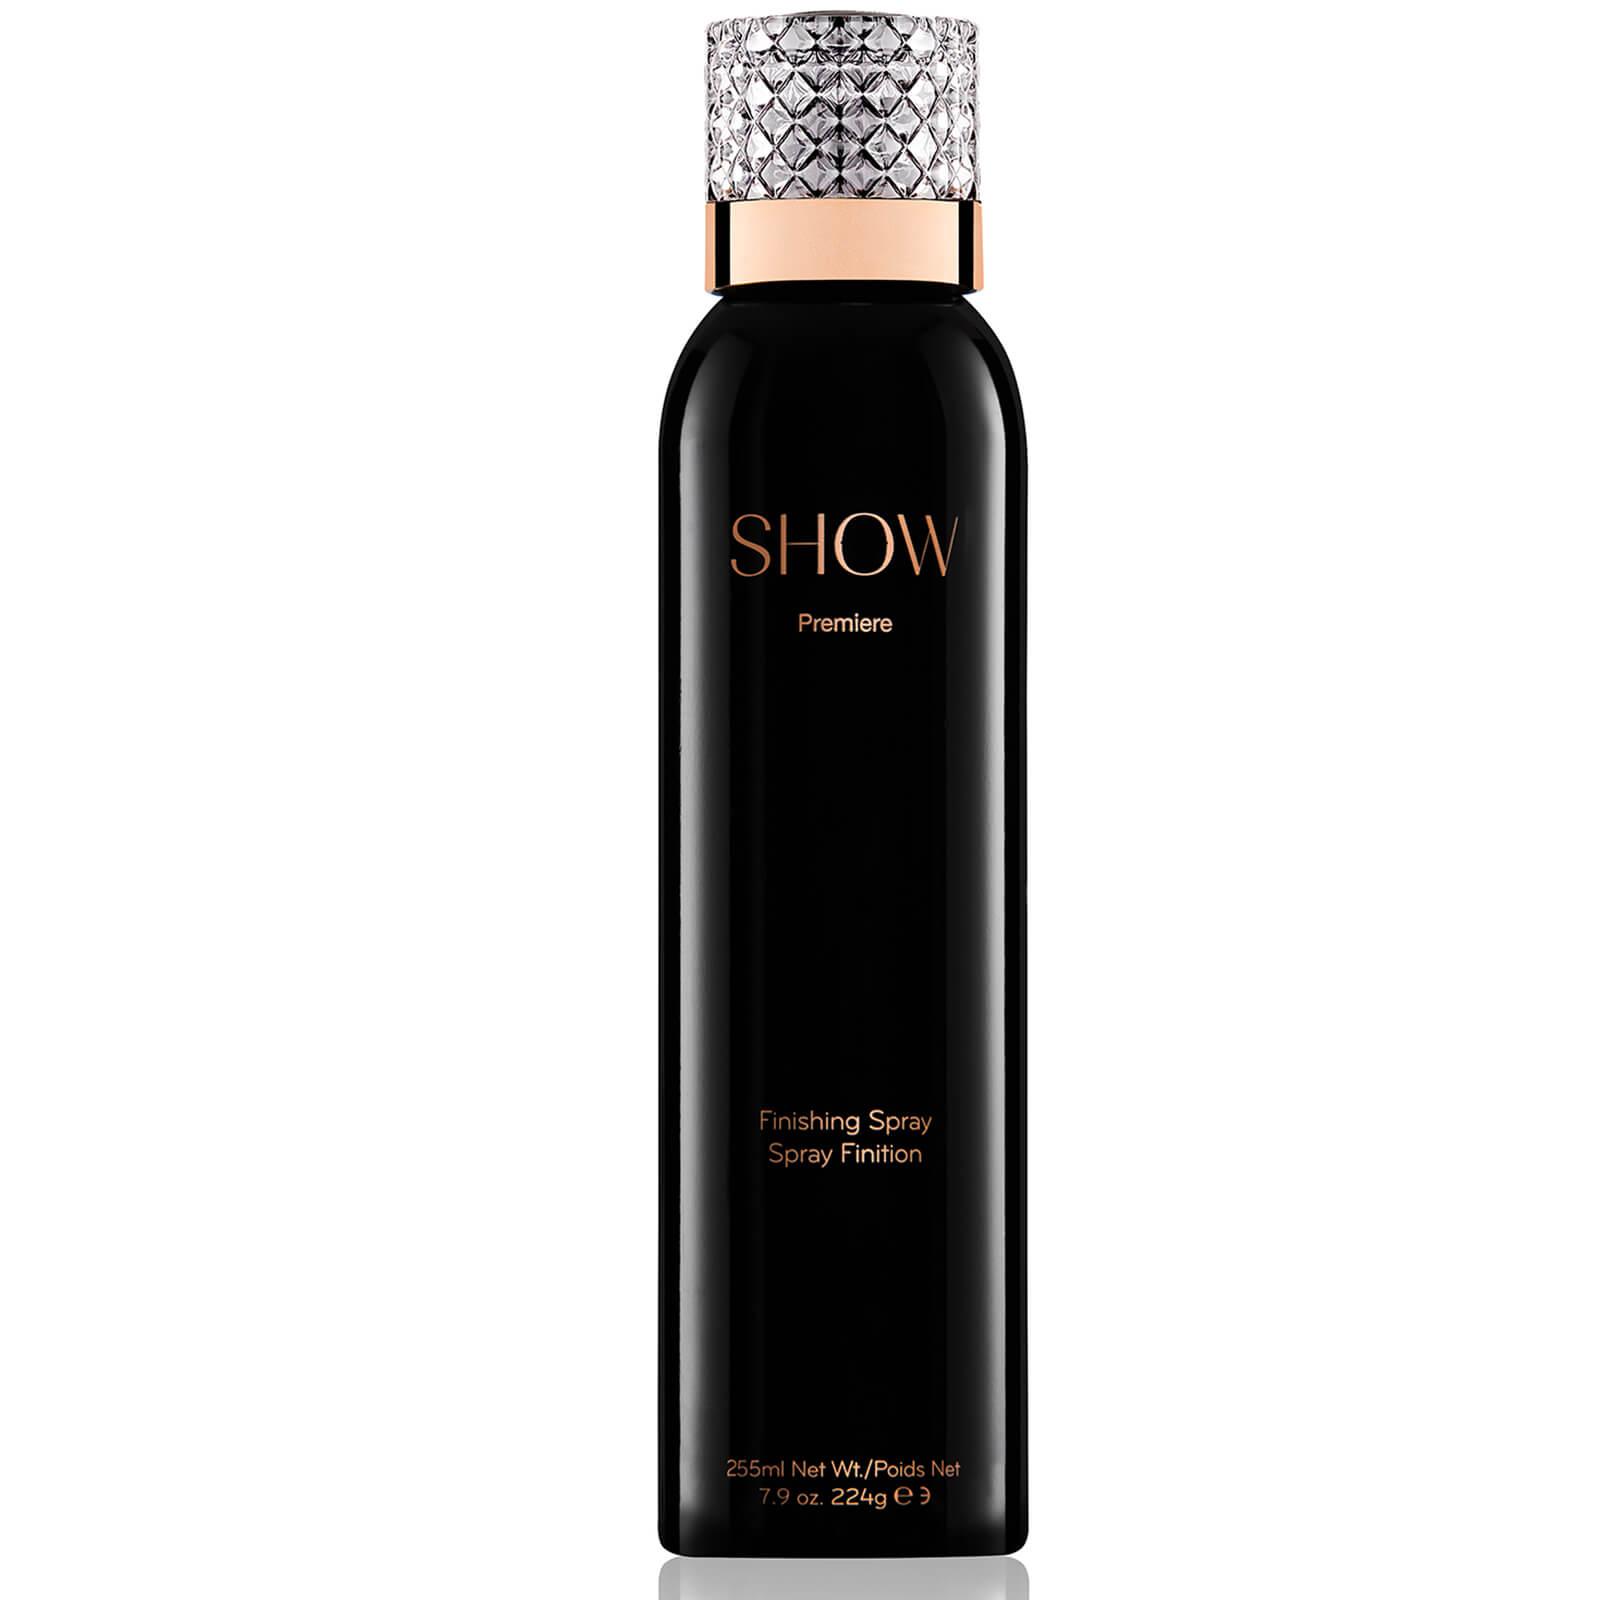 Show Beauty Premiere spray de finition (255ml)